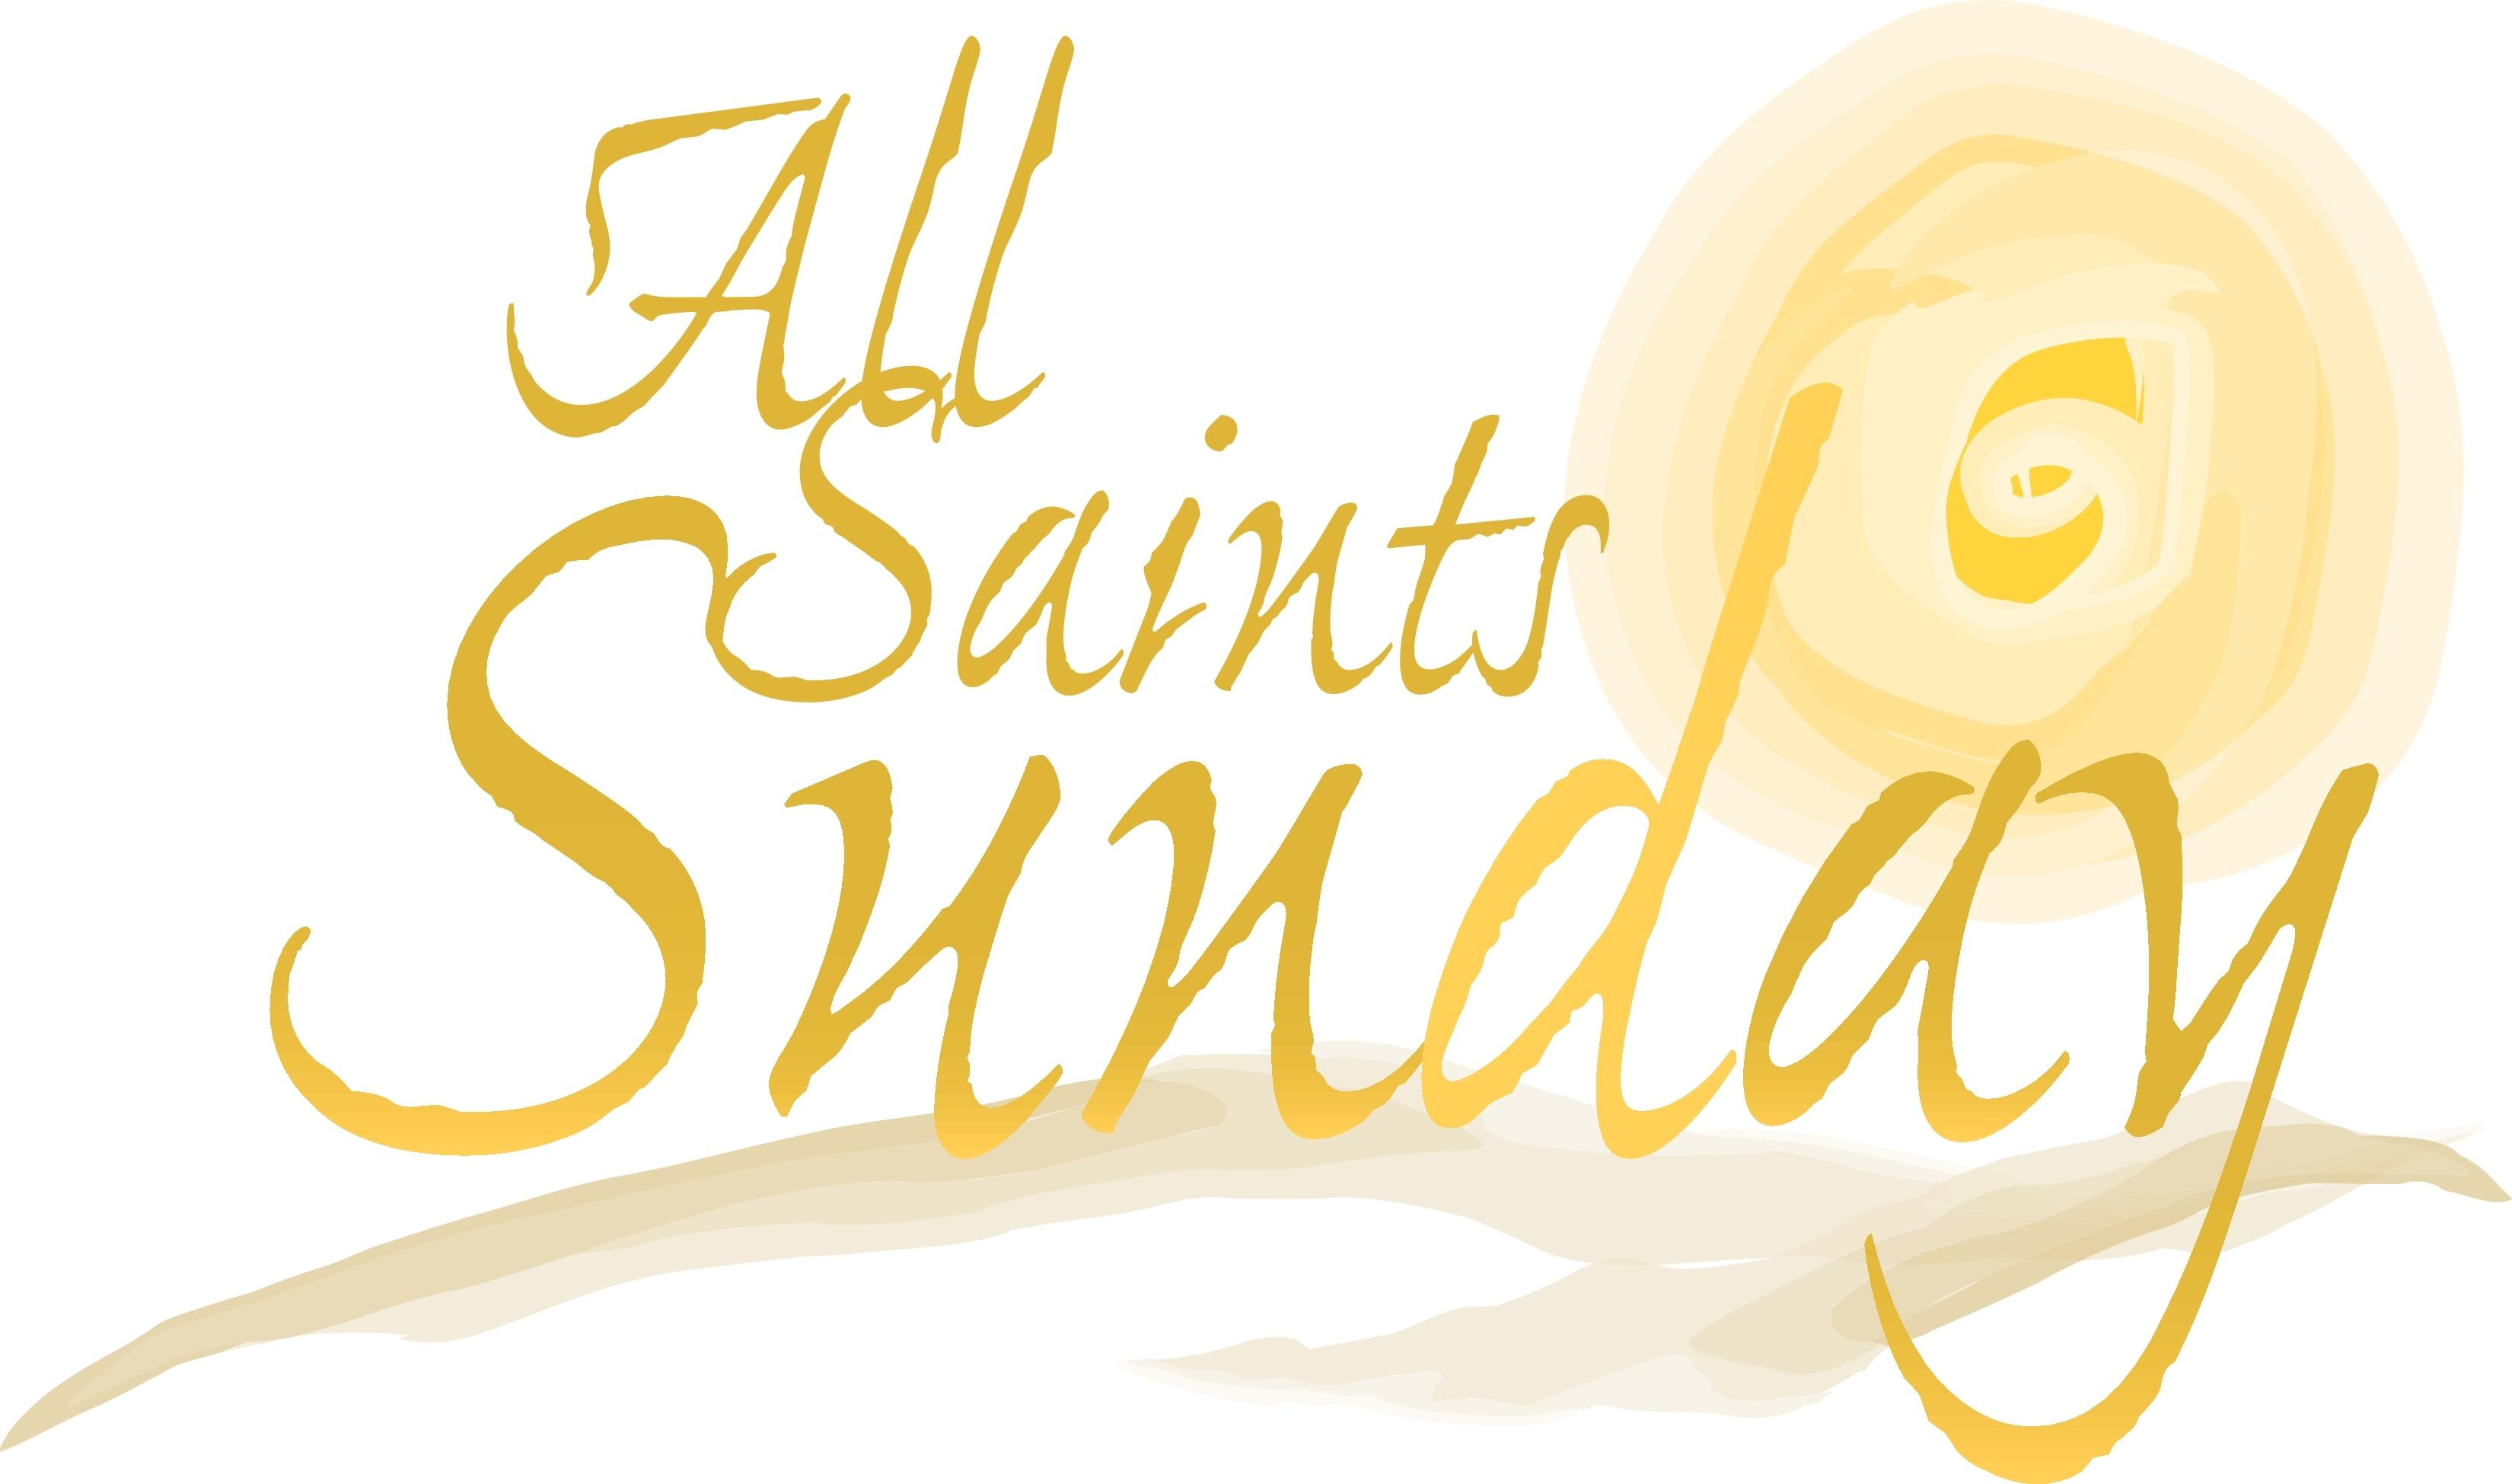 All saints day photos jen hill photo m4hsunfo